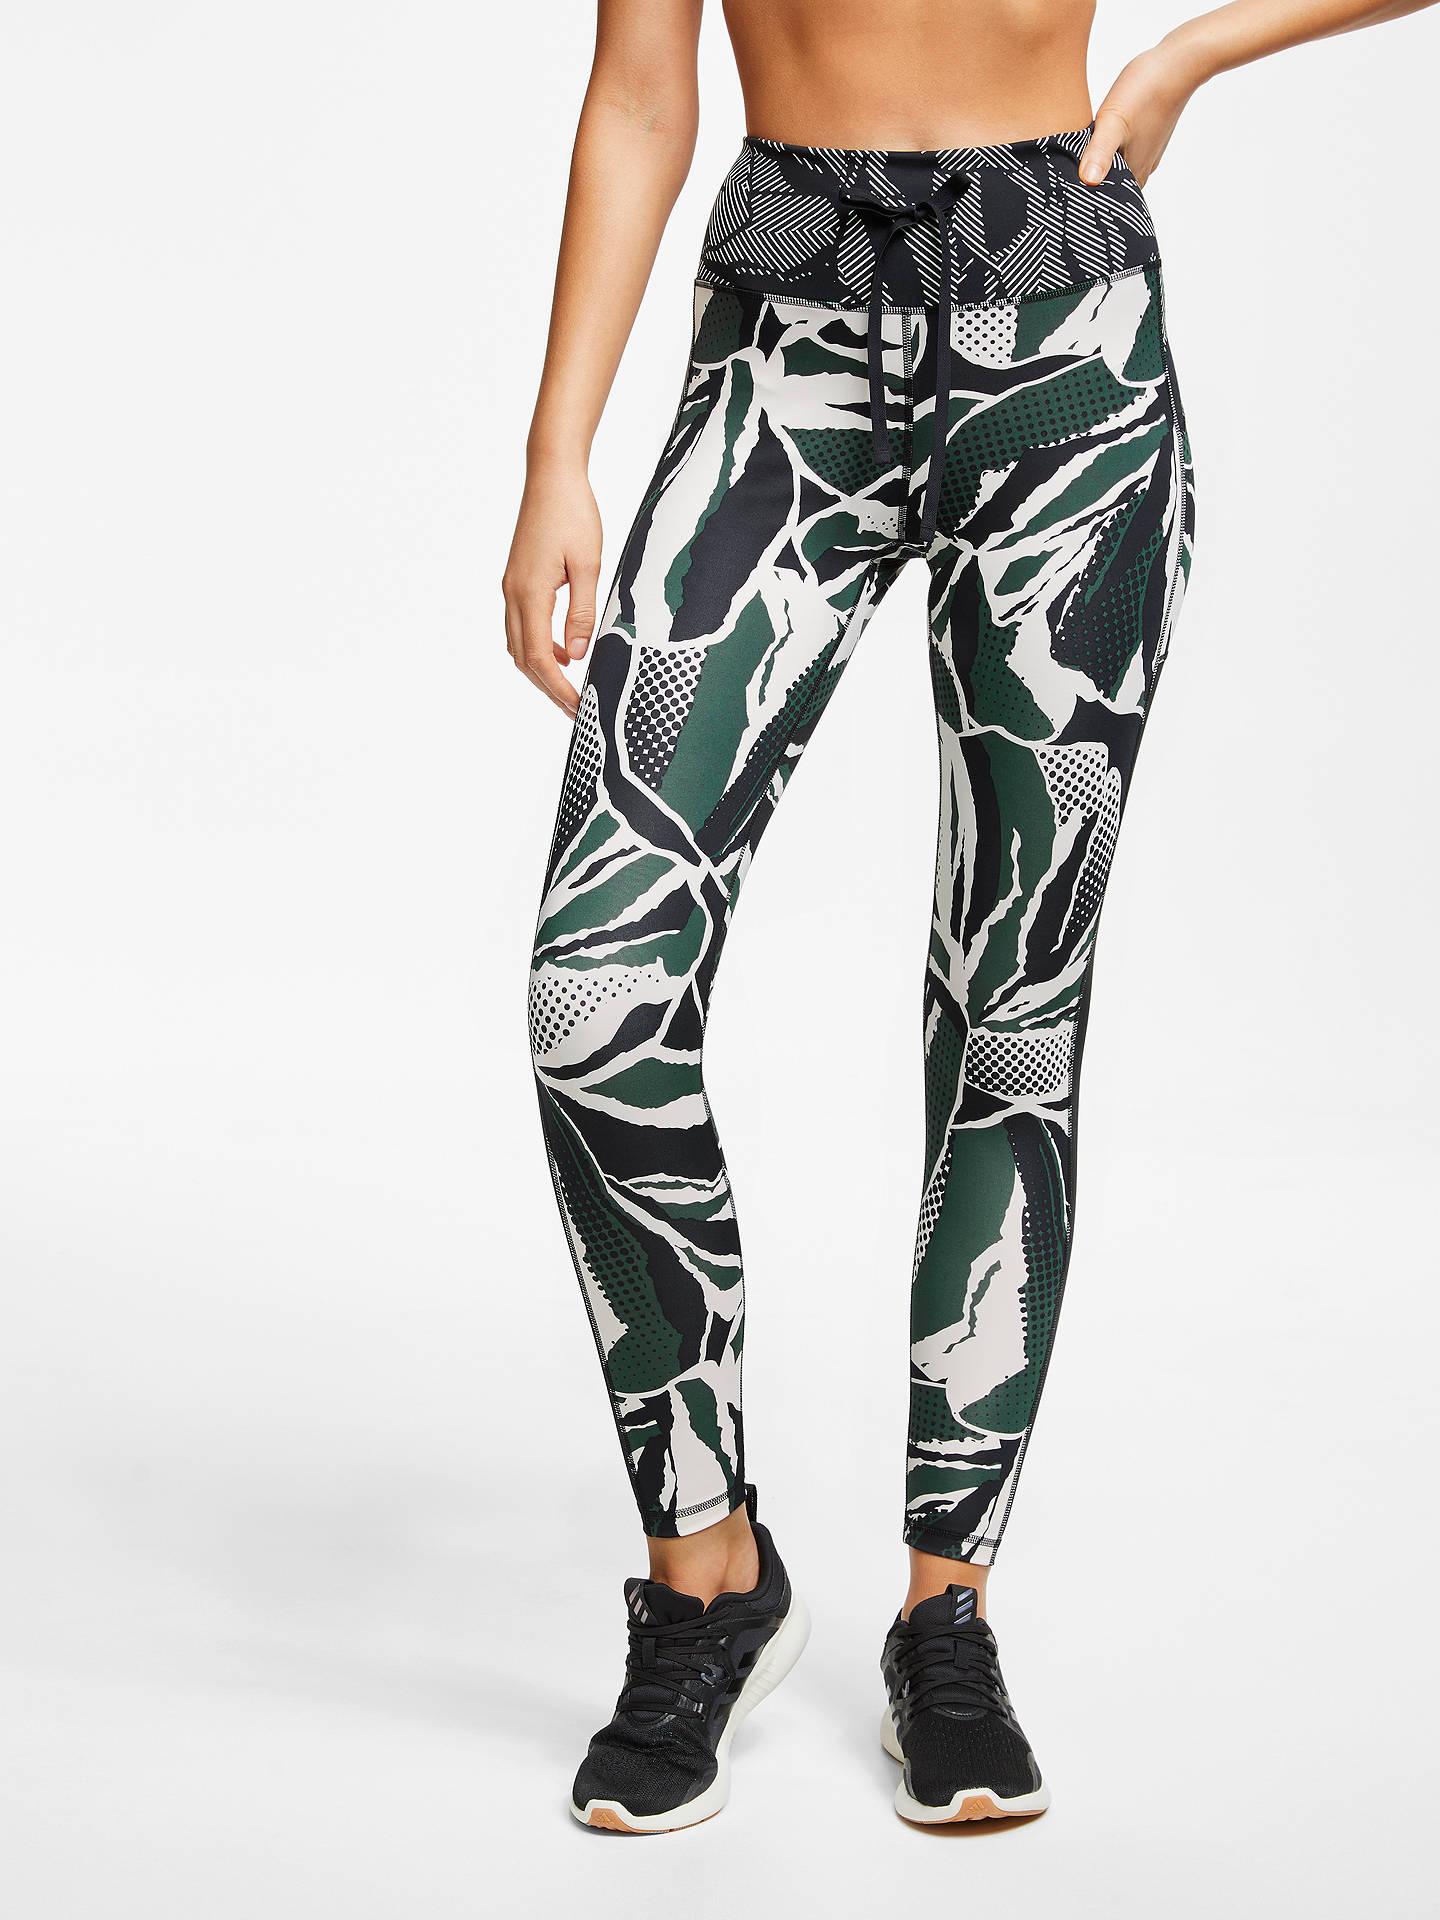 f4a46becc0b68 Buy adidas Floral Paper Print 7/8 Training Tights, Black/Green/White ...